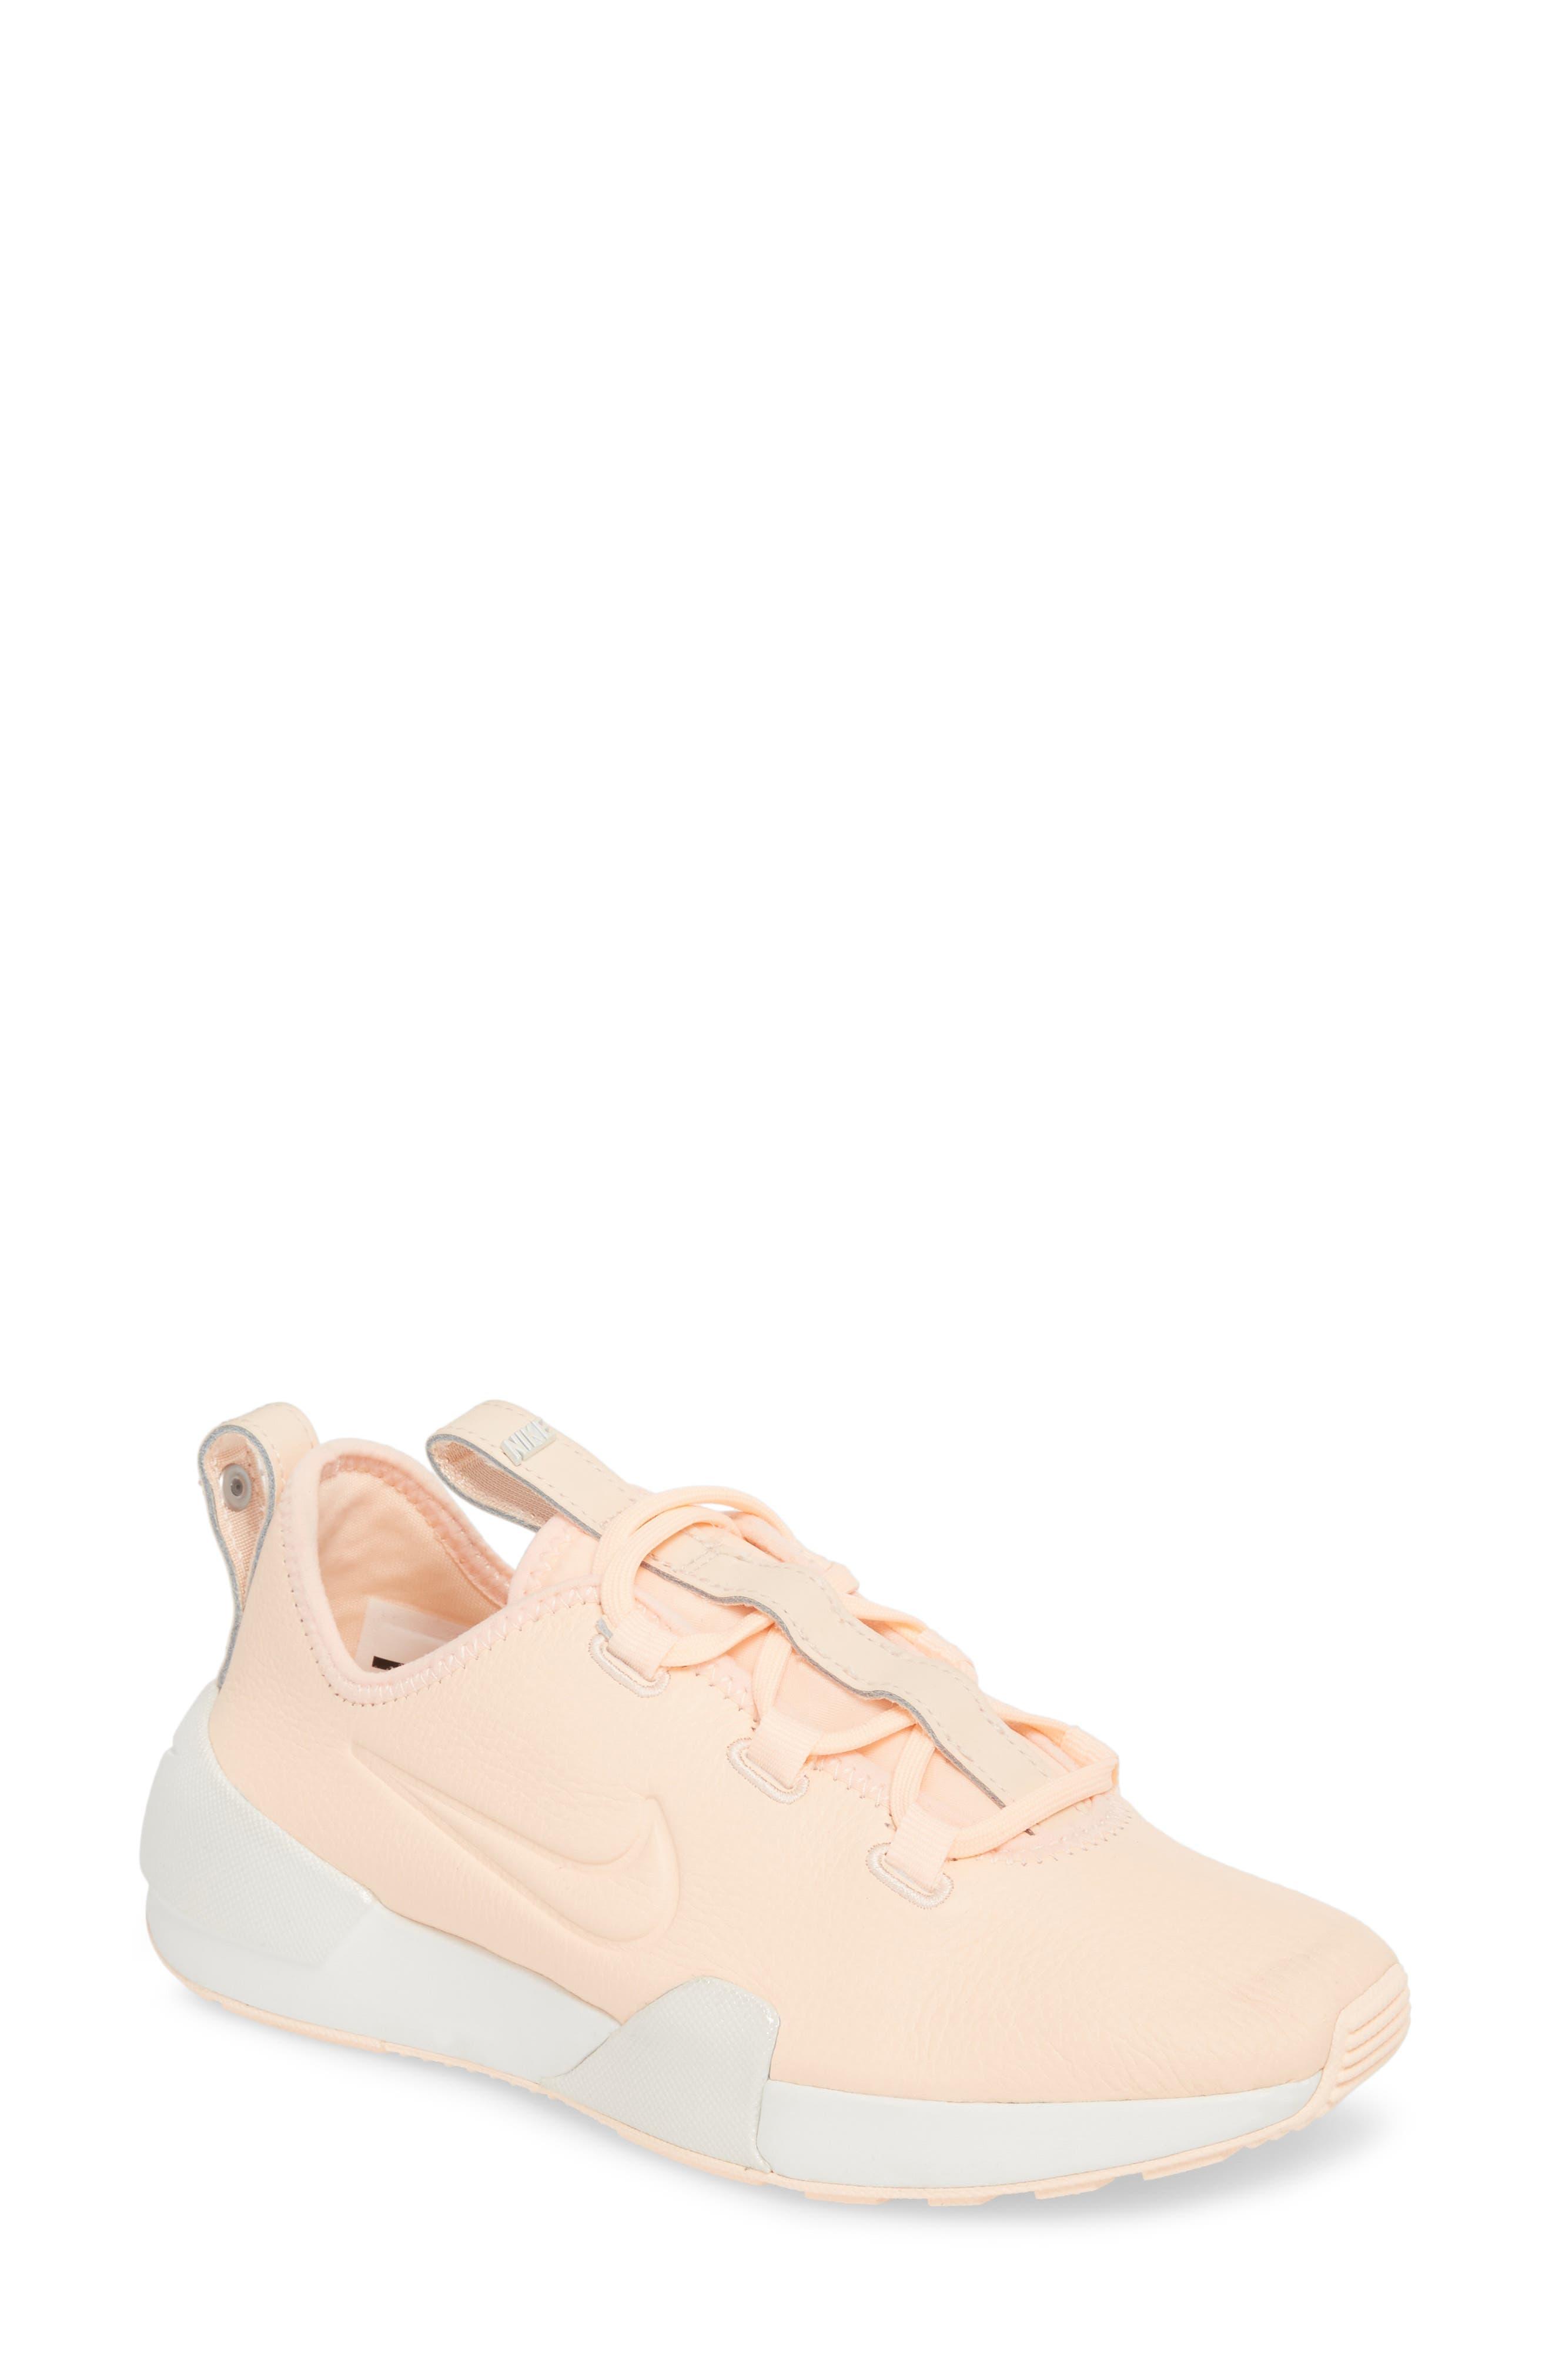 Ashin Modern LX Sneaker,                             Main thumbnail 1, color,                             800